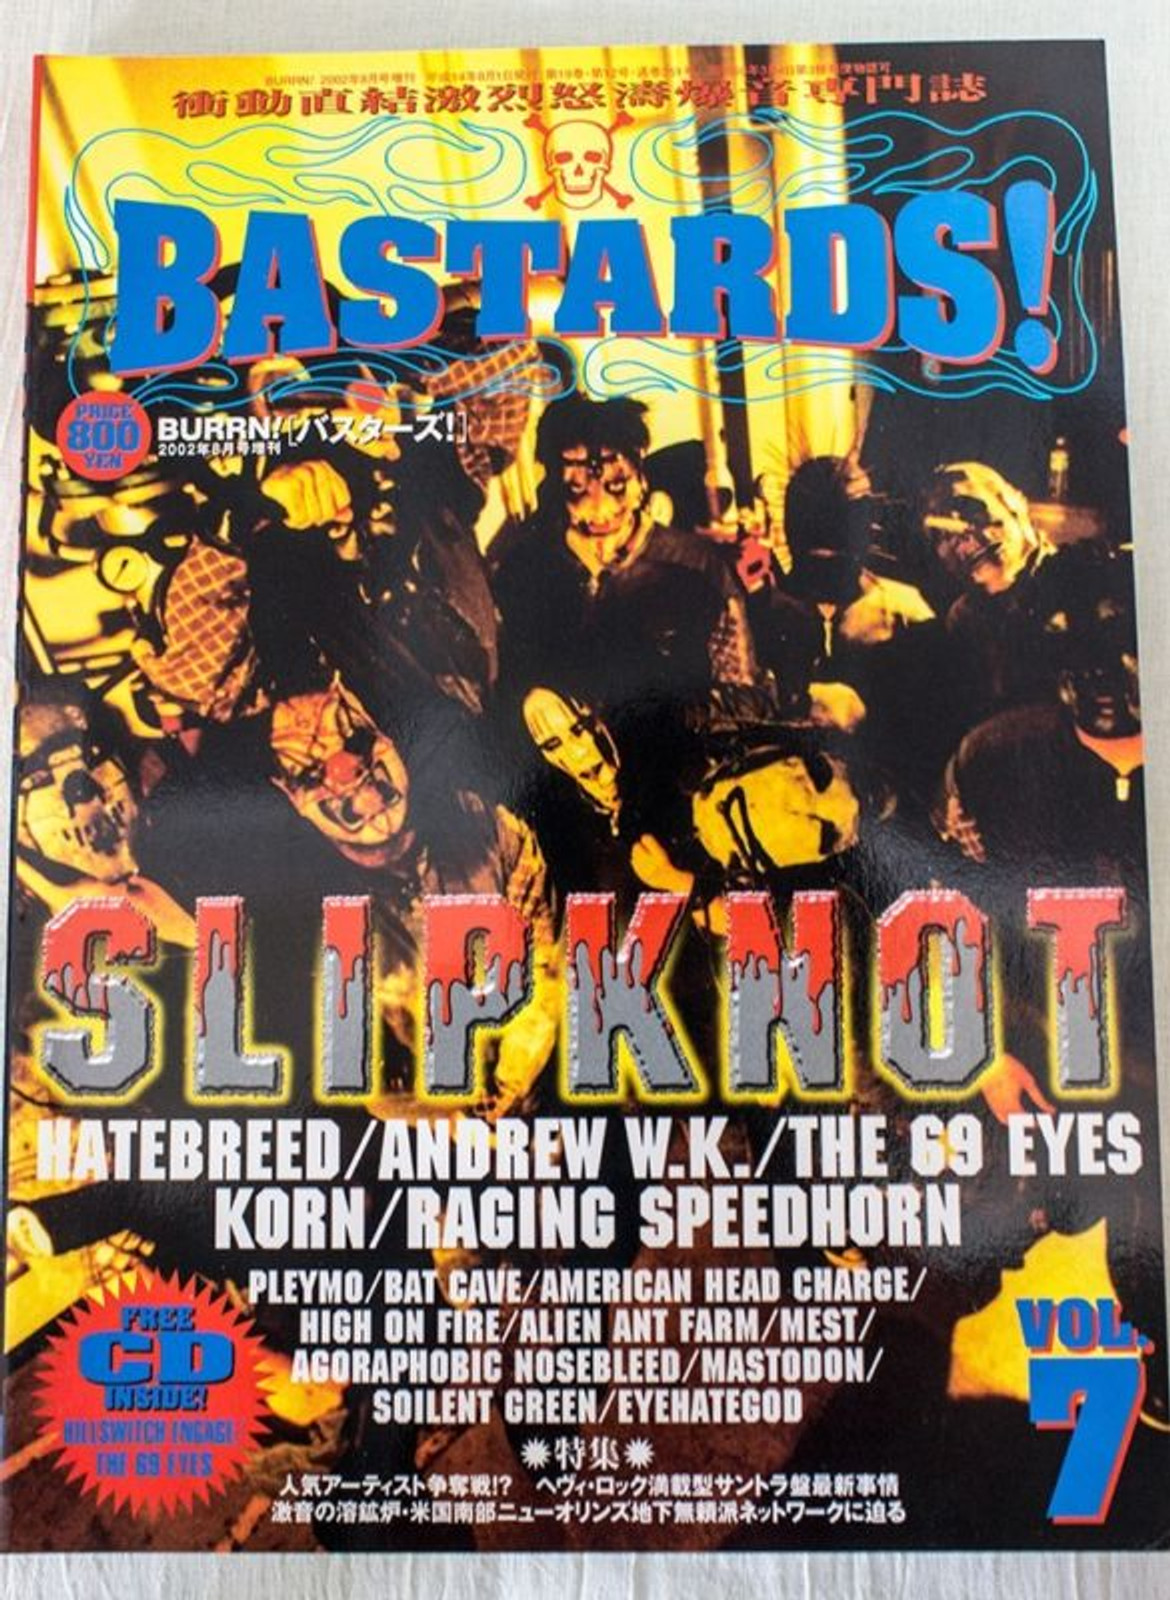 2002 Vol.7 BASTARDS! BURRN! Japan Magazine SLIPKNOT/THE 69 EYES/HATEBREED/KORN